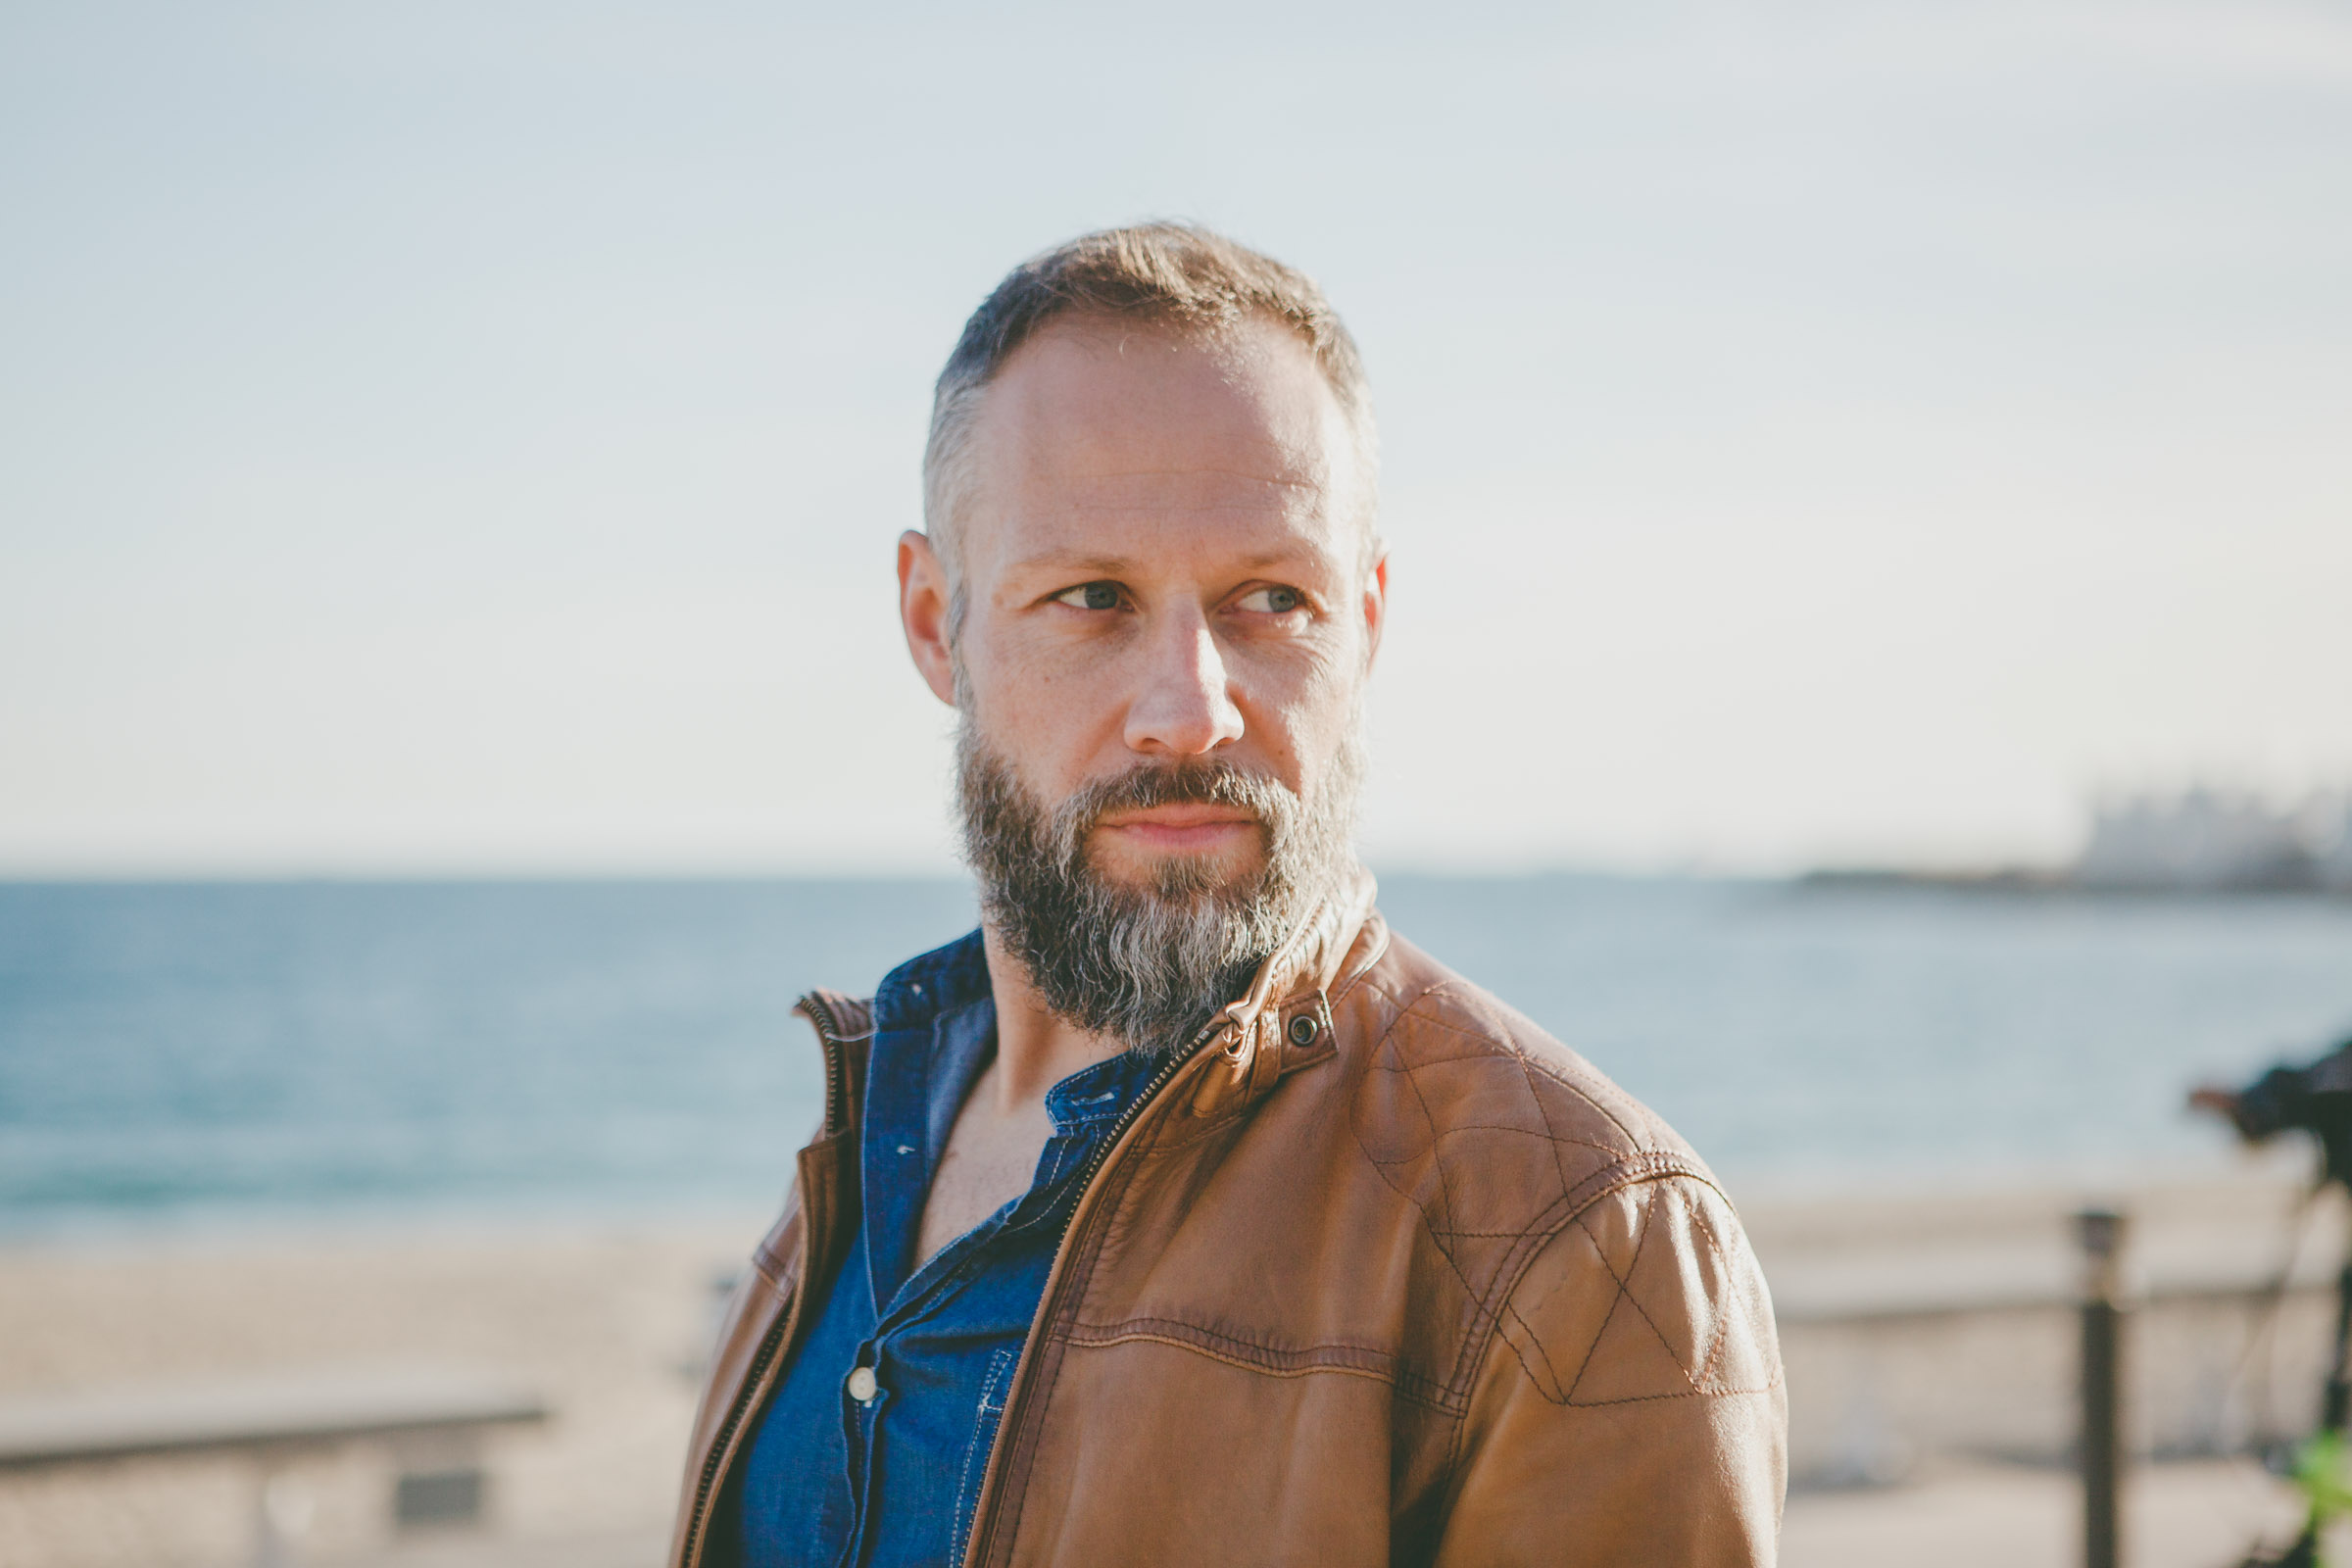 Manfred, founder of happinessride.com